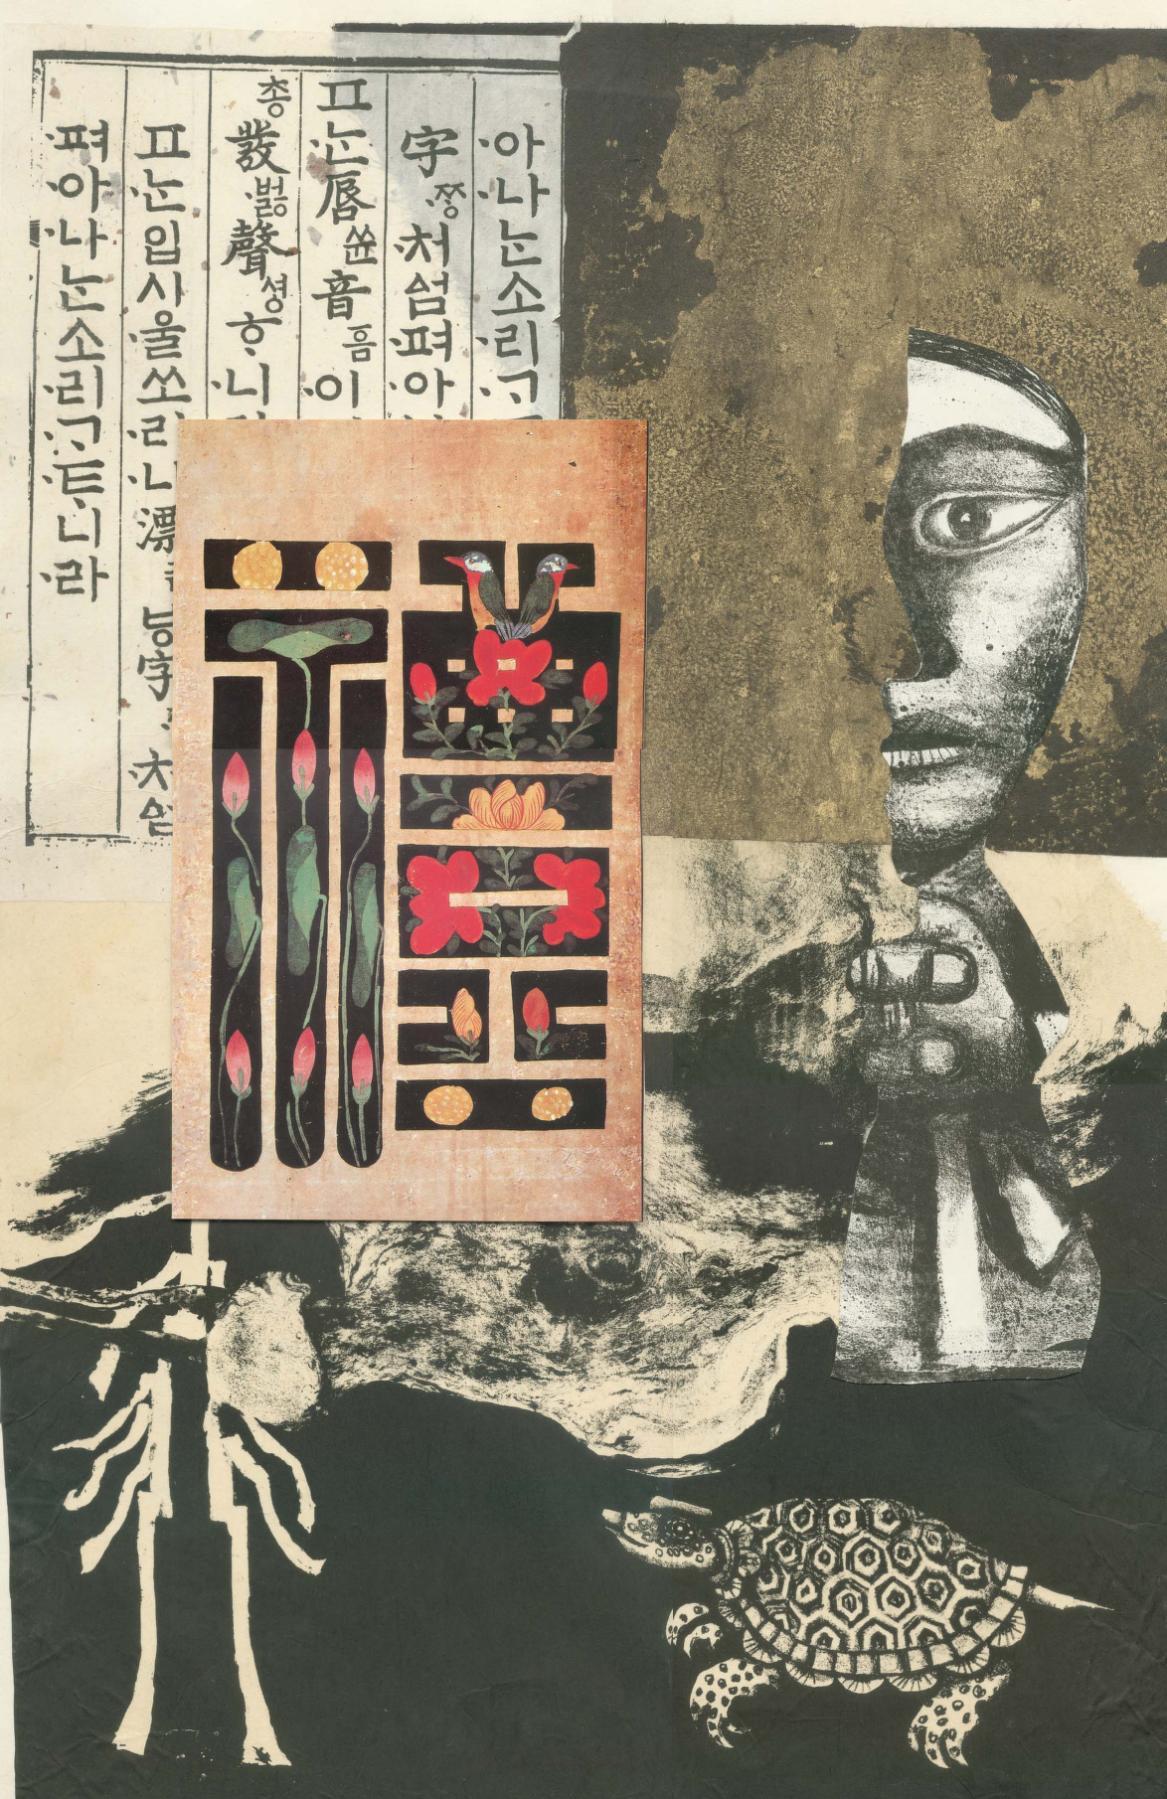 Shaman's Prayer | 巫女の祈り (2005)